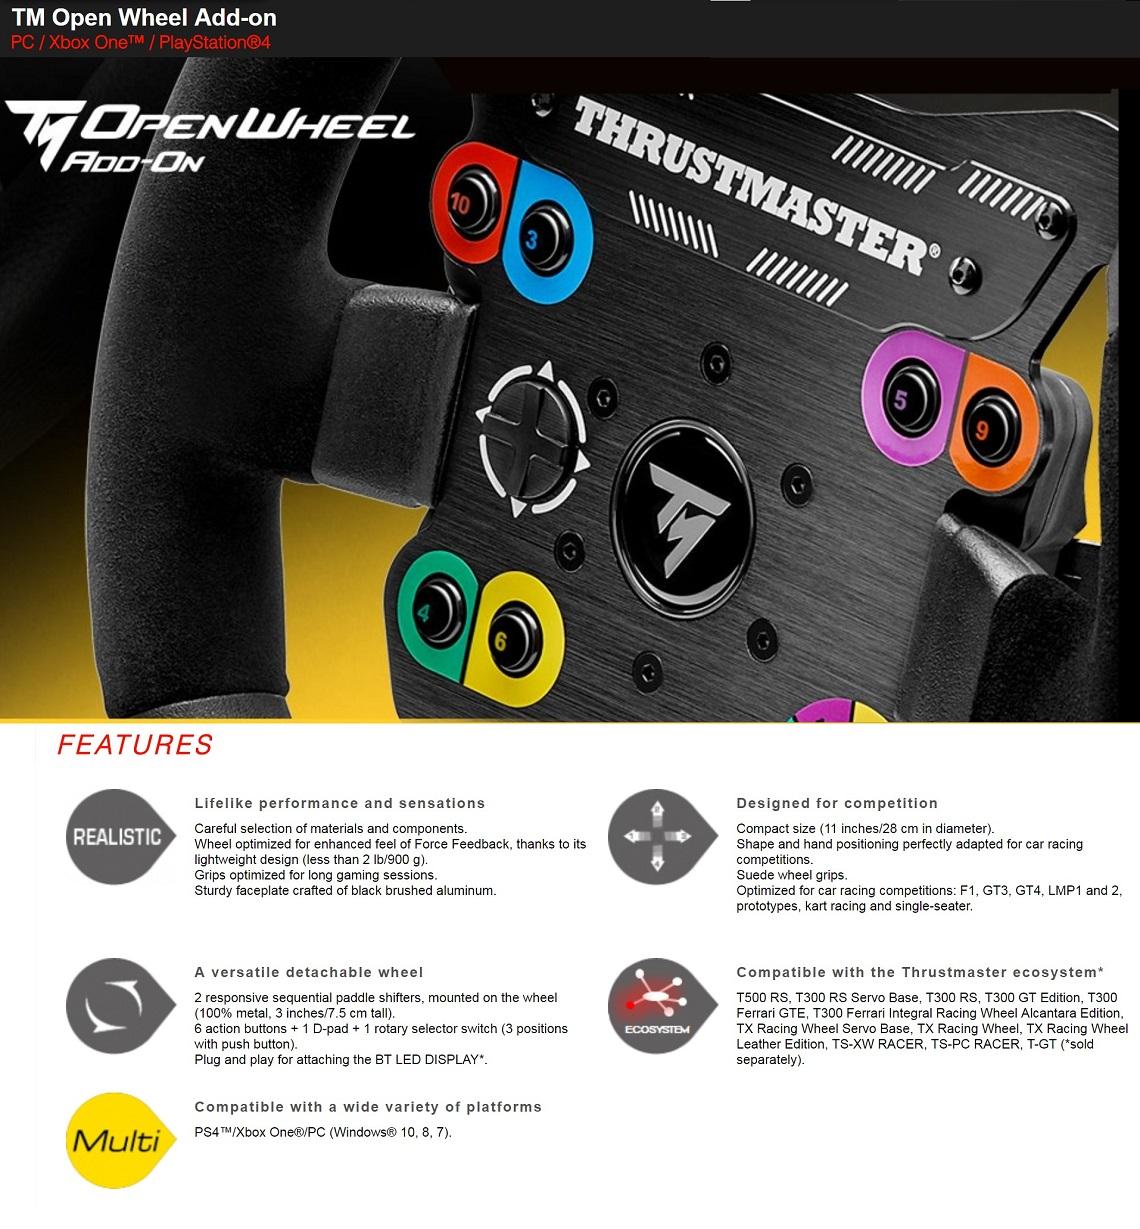 Thrustmaster TM Open Wheel Add-On Detachable Wheel Rim For PC, Xbox One & PS4